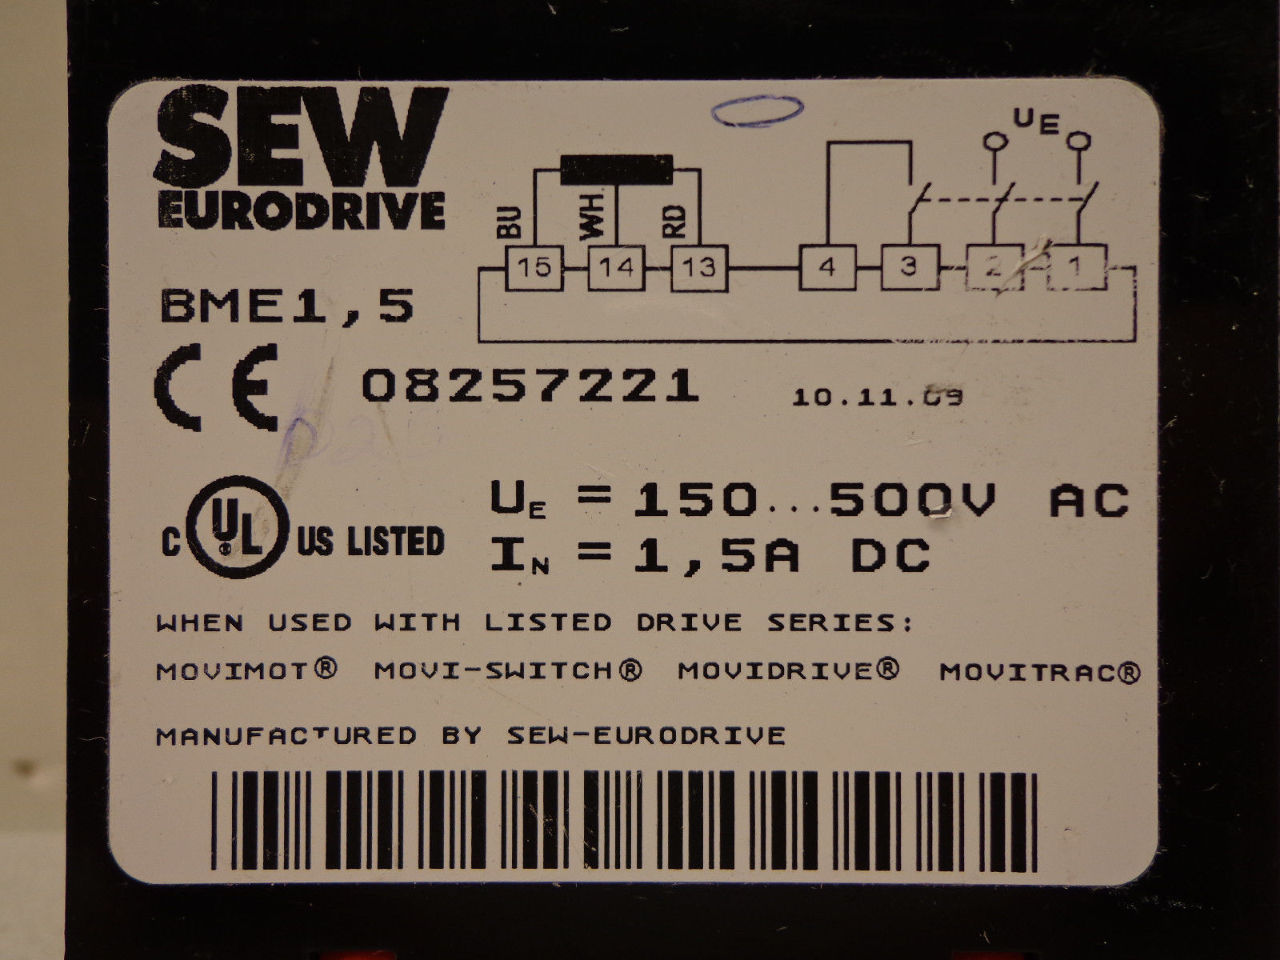 480v 3 Phase Heater Wiring Diagram Furthermore 480v 3 Phase Heater